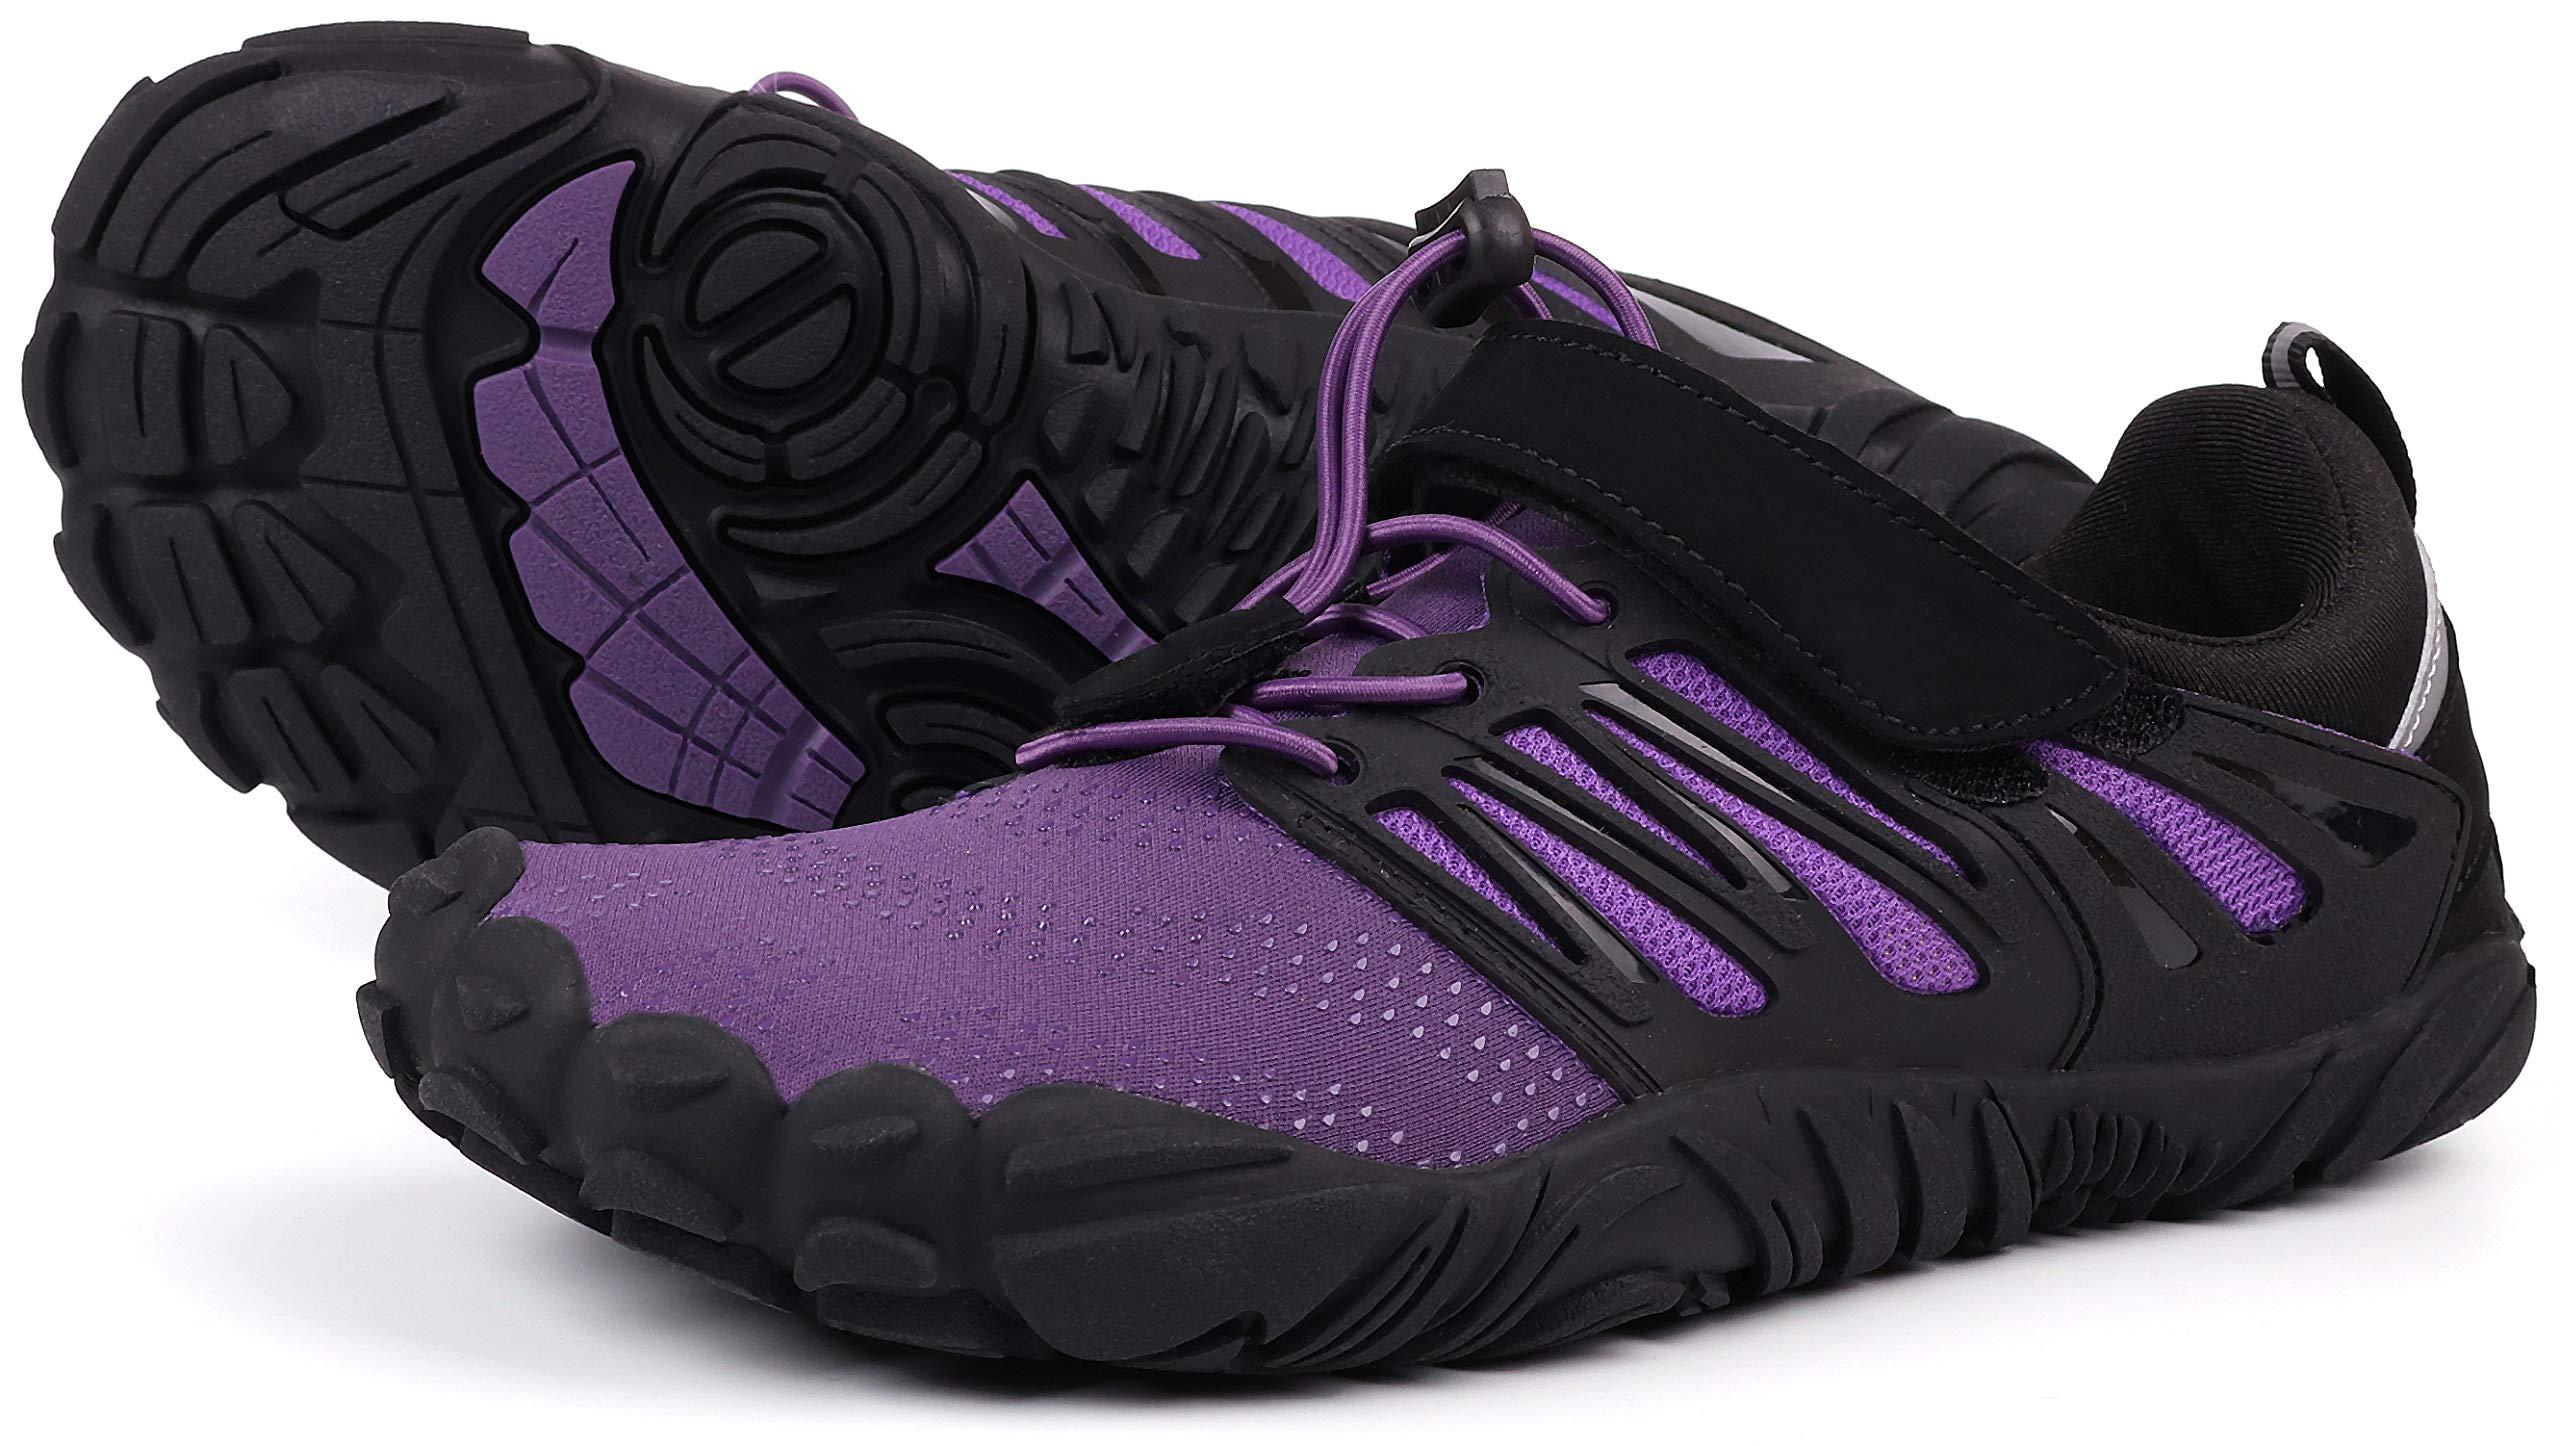 JOOMRA Women Minimalist Road Running Shoes Barefoot Climbing Wide Walking Athletic Lightweight Hiking Trekking 5 Toes Workout Sneakers Footwear Purple Size 6